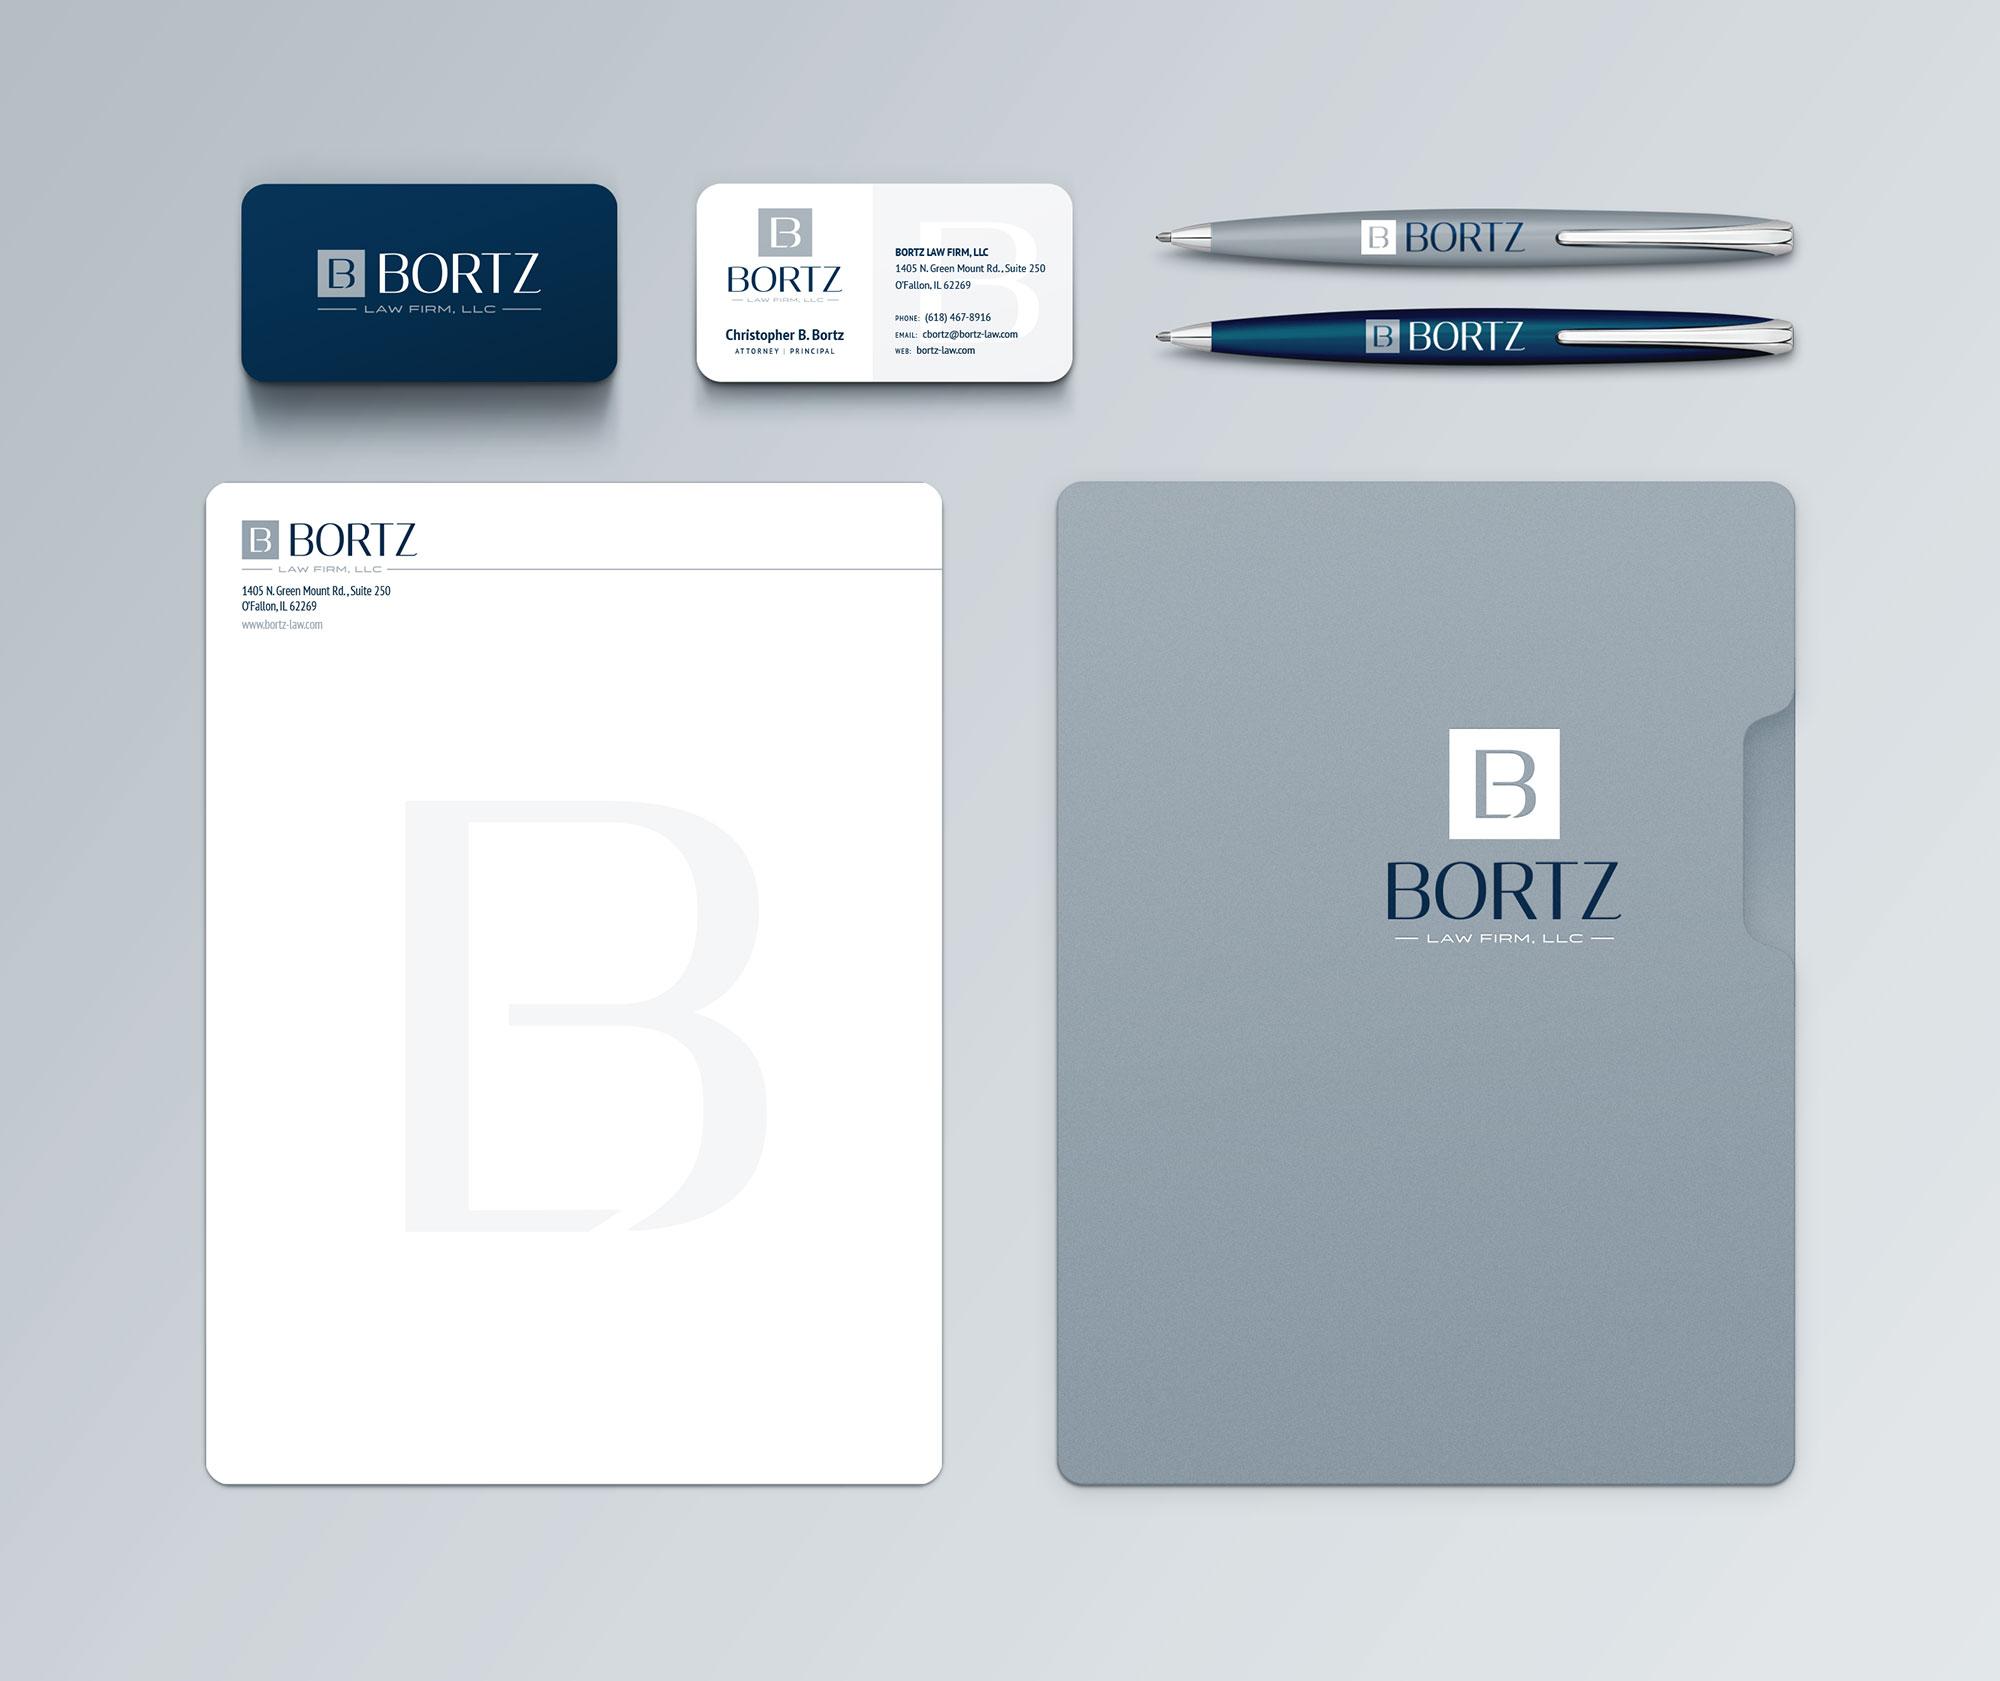 Bortz-identity-design